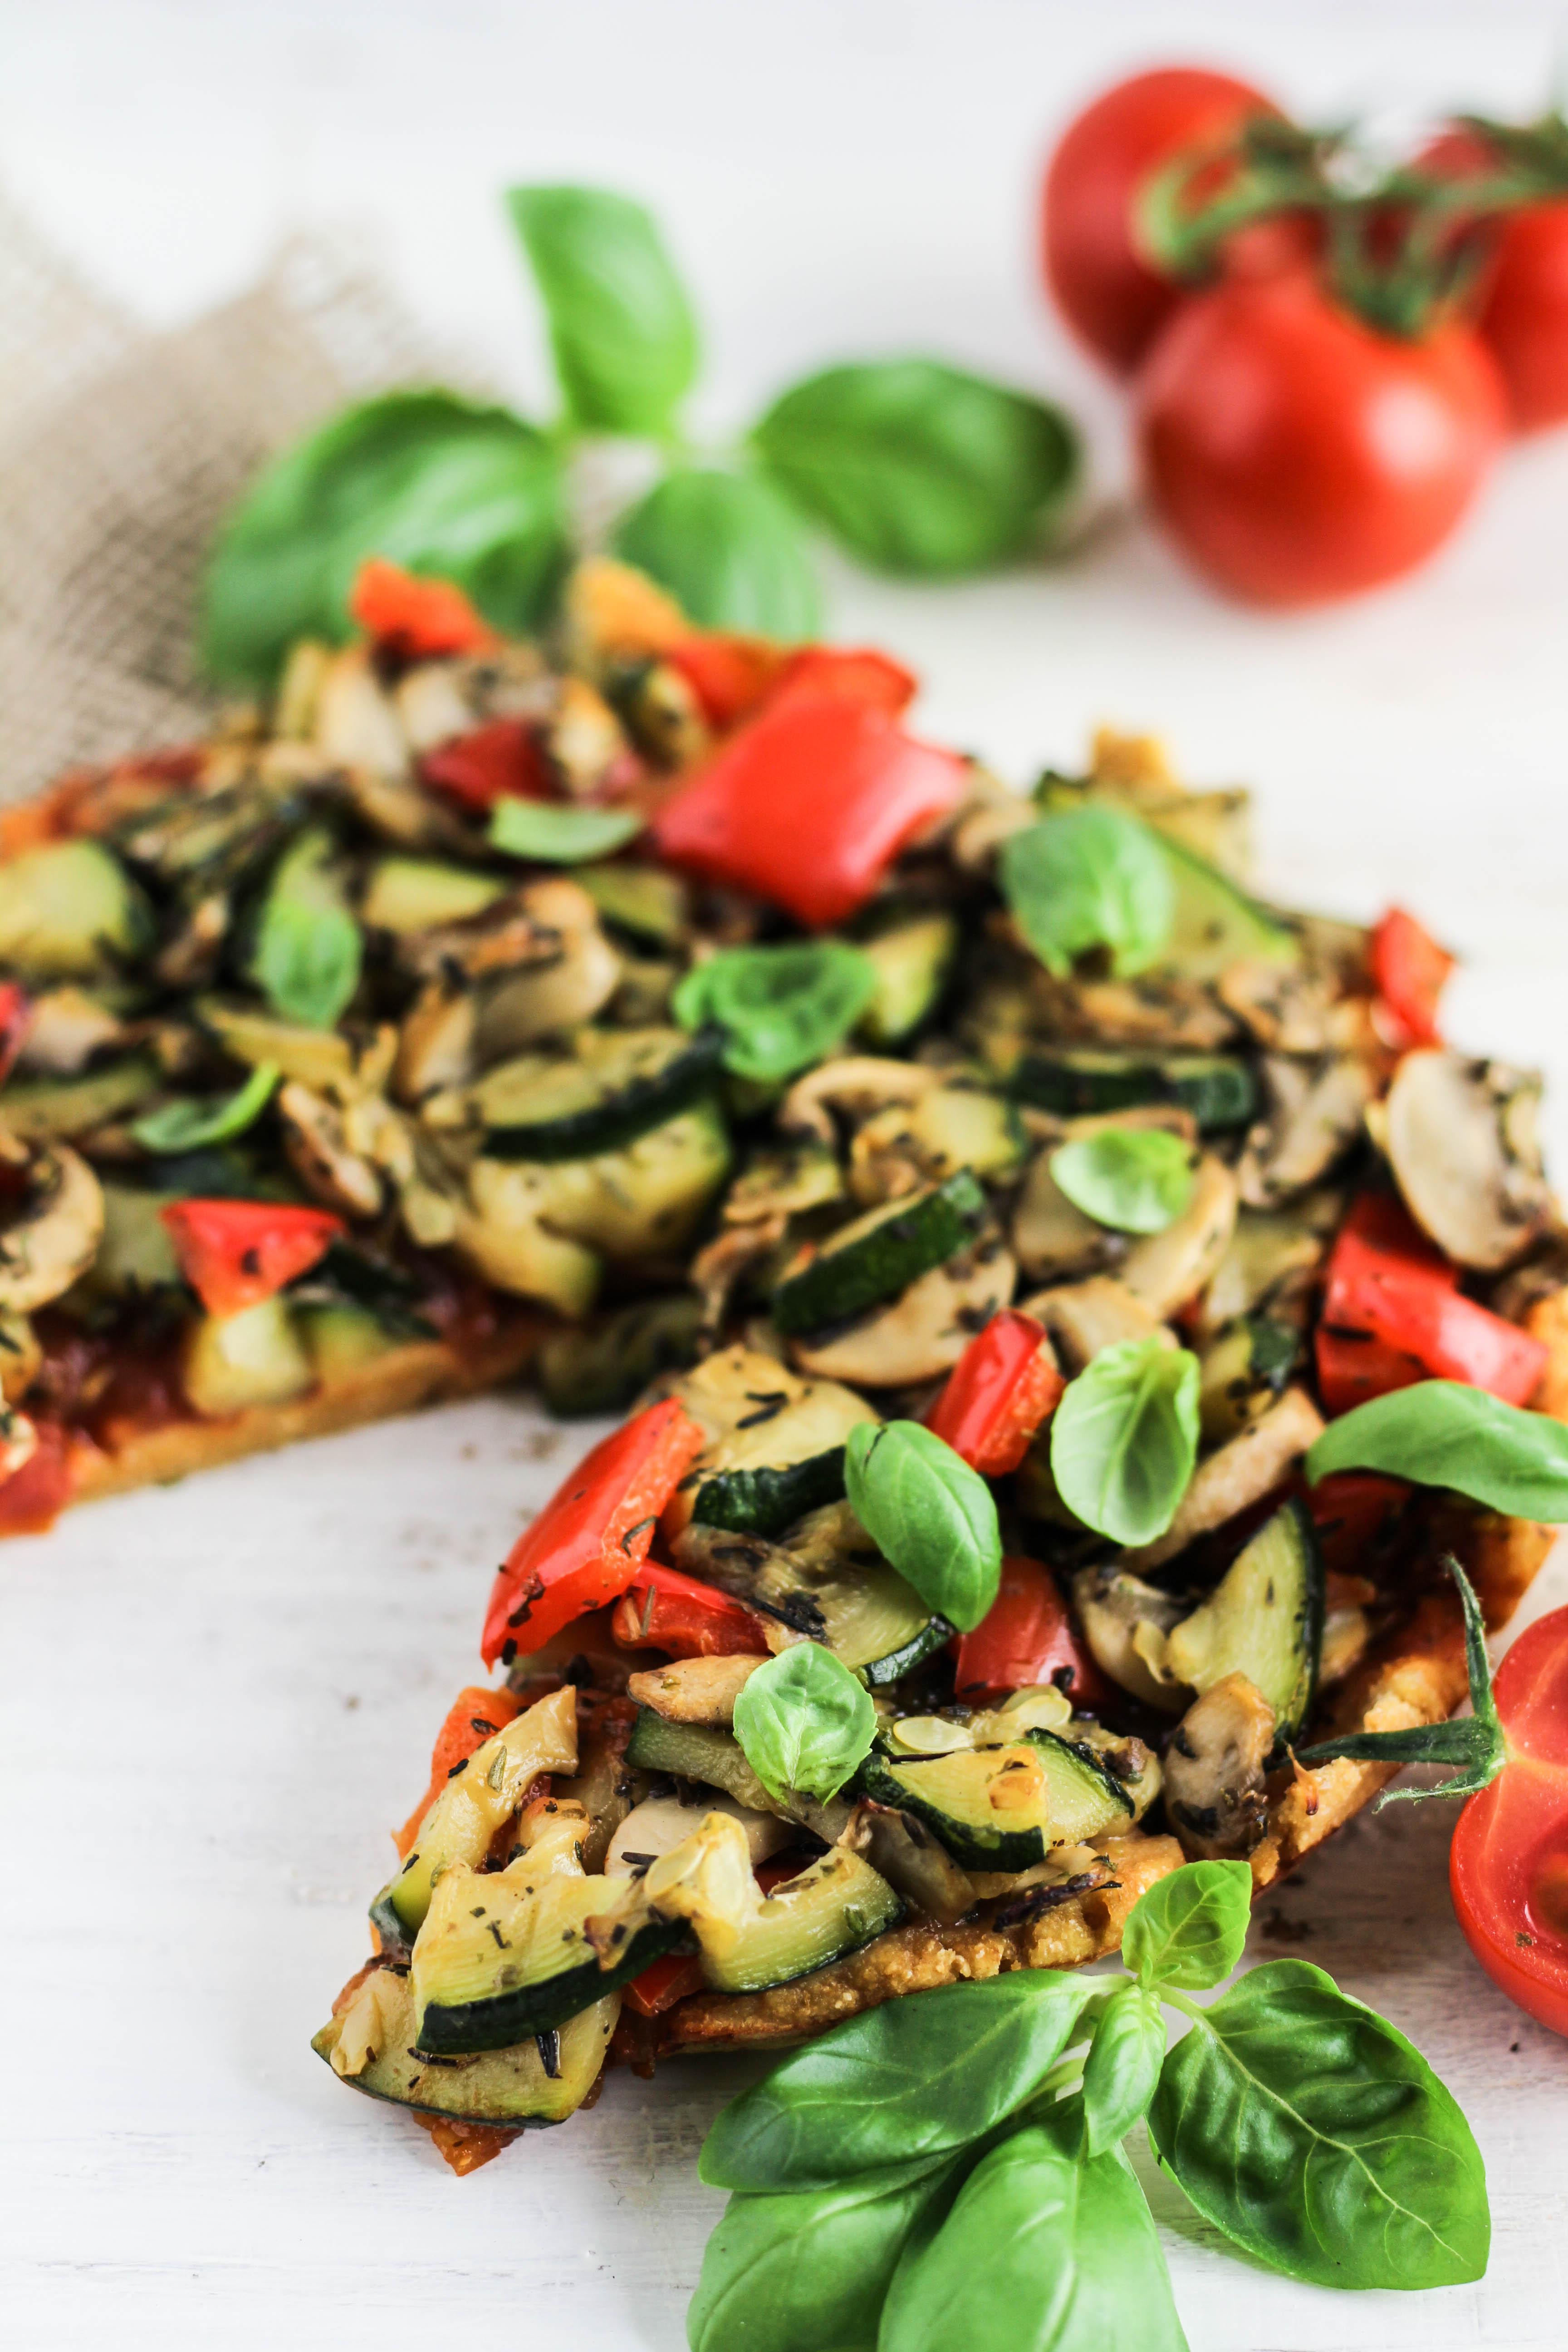 gluten-free-and-vegan-pizza-super-tasty-recipe